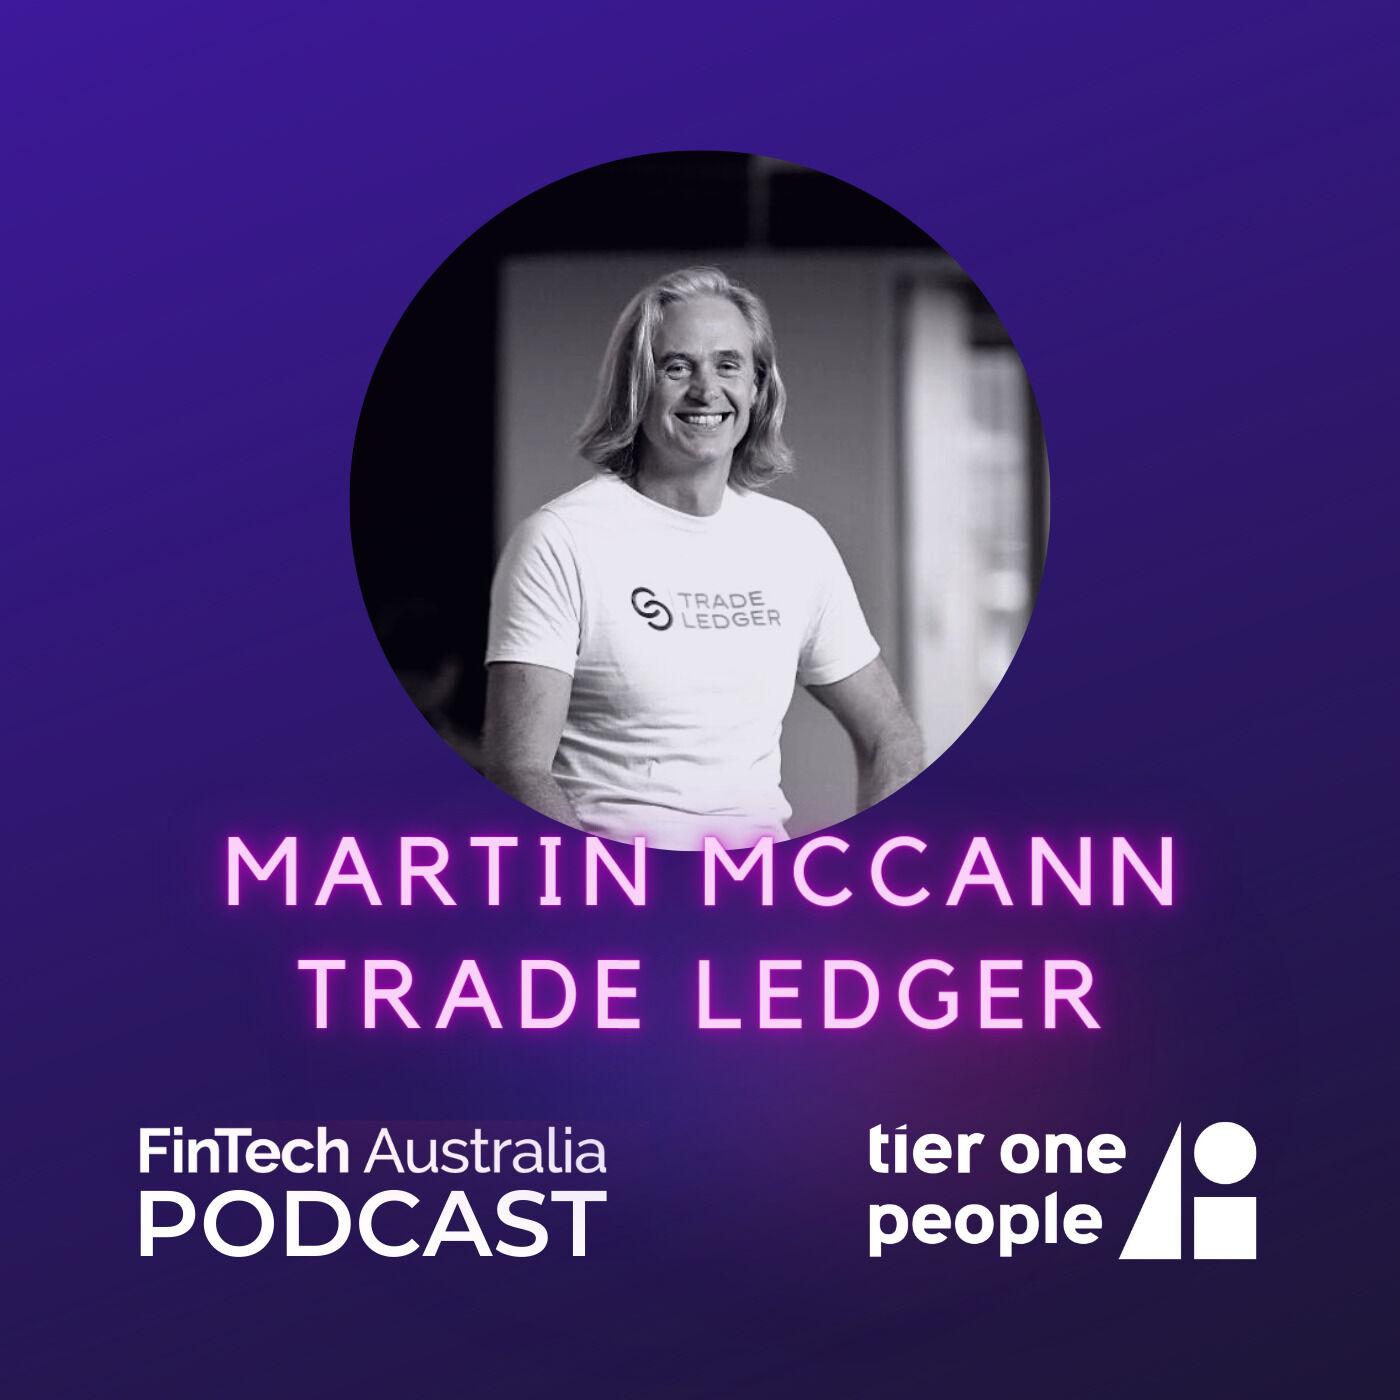 #68 Martin McCann - Trade Ledger